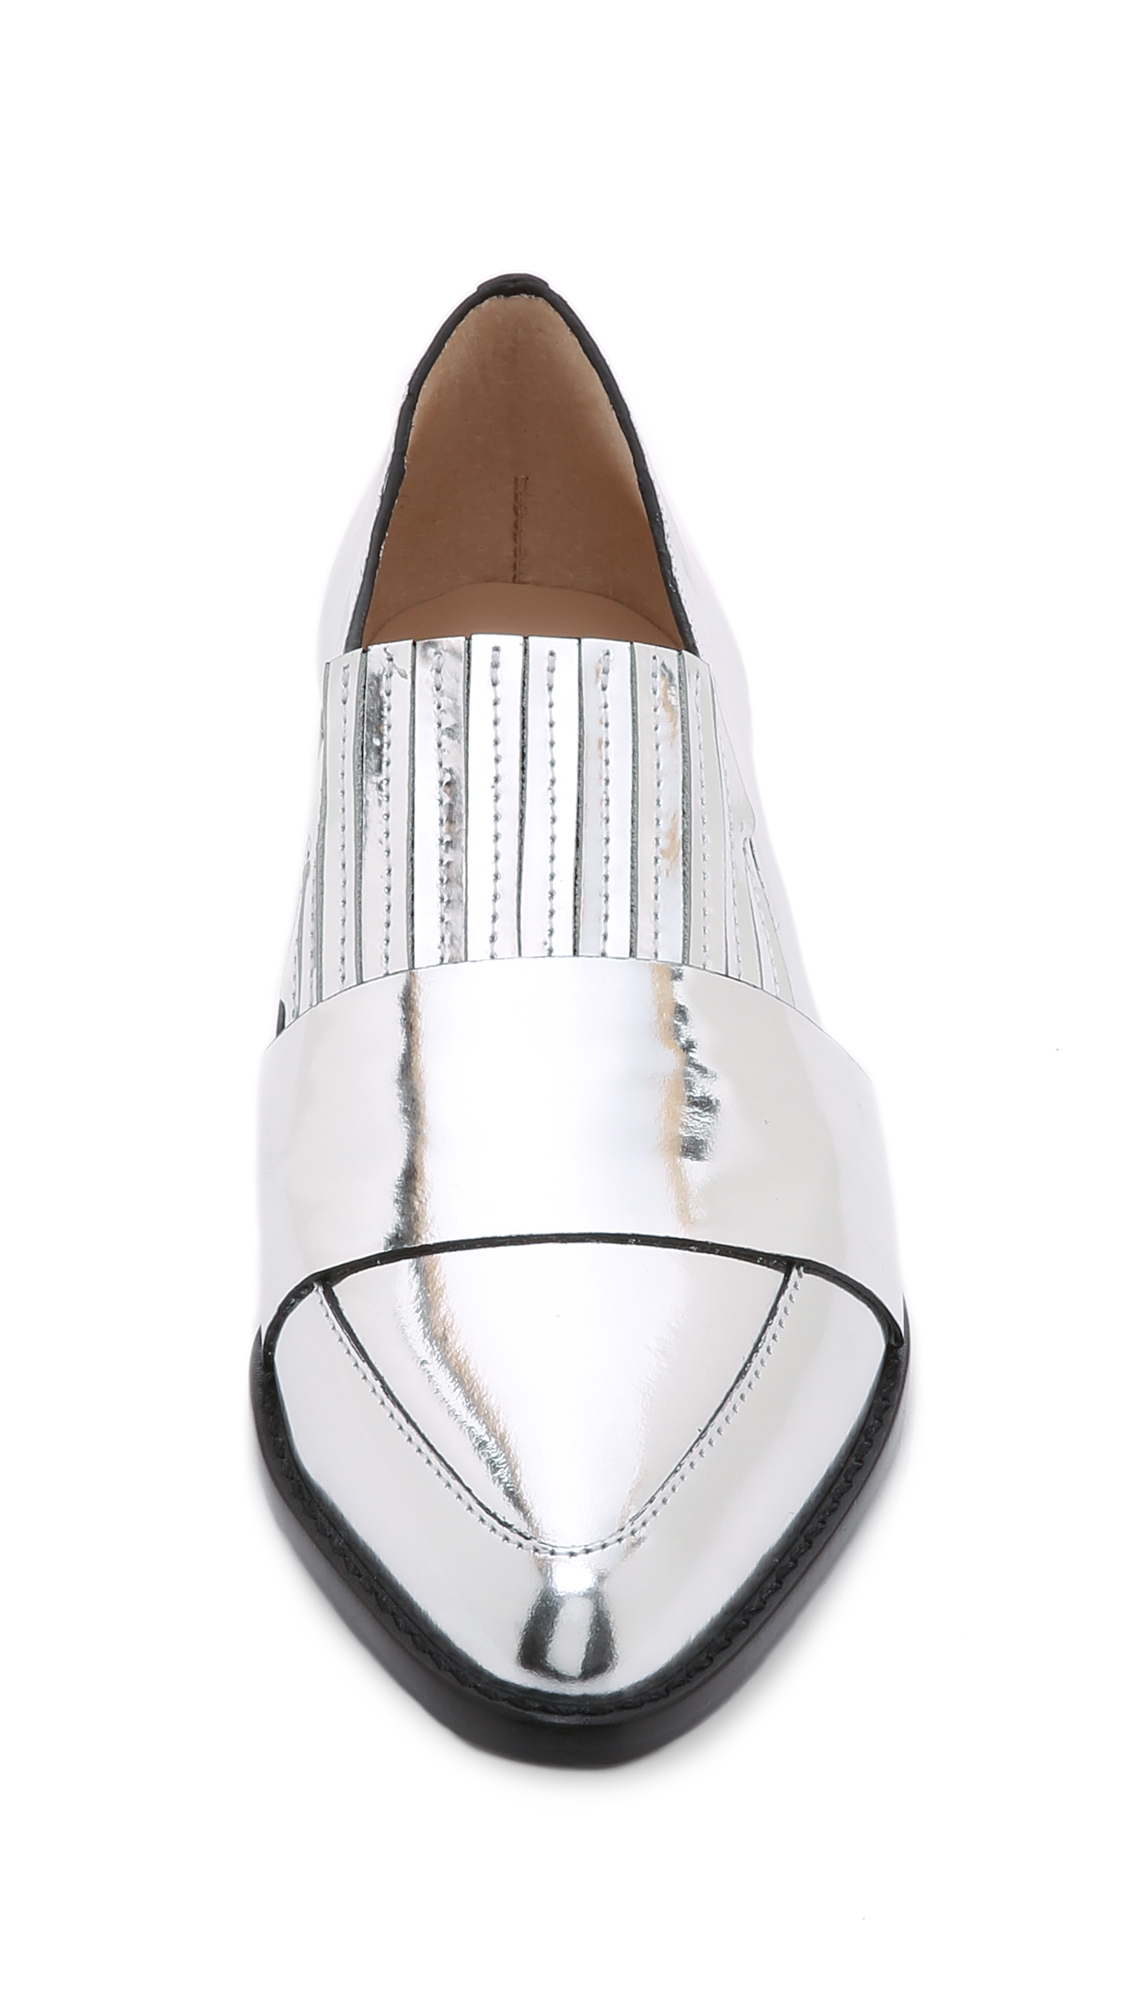 58be864fc9c Lyst - Loeffler Randall Rosa Loafers - Silver in Metallic